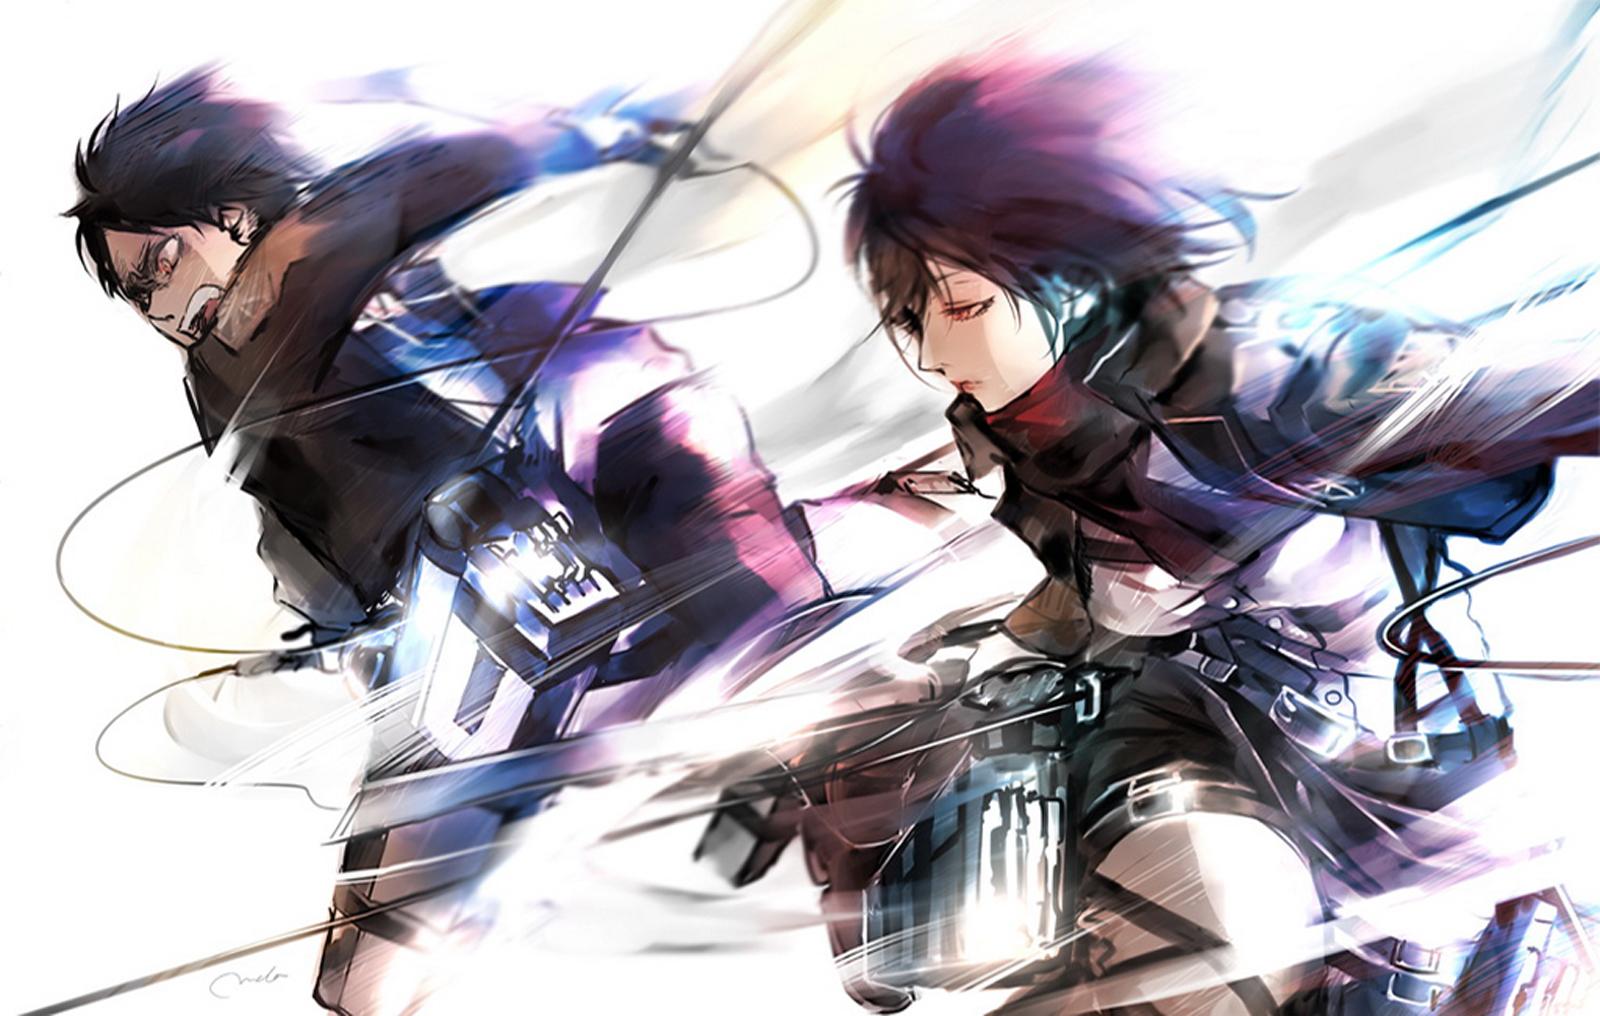 AOT Wallpapers - Shingeki no Kyojin (Attack on titan) Photo (36001016) - Fanpop